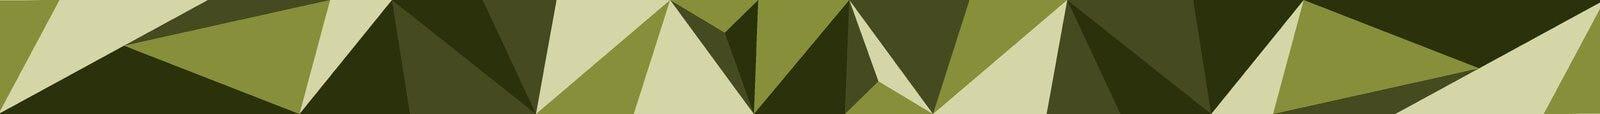 Vector modern cool camouflage, digital header Stock Photo